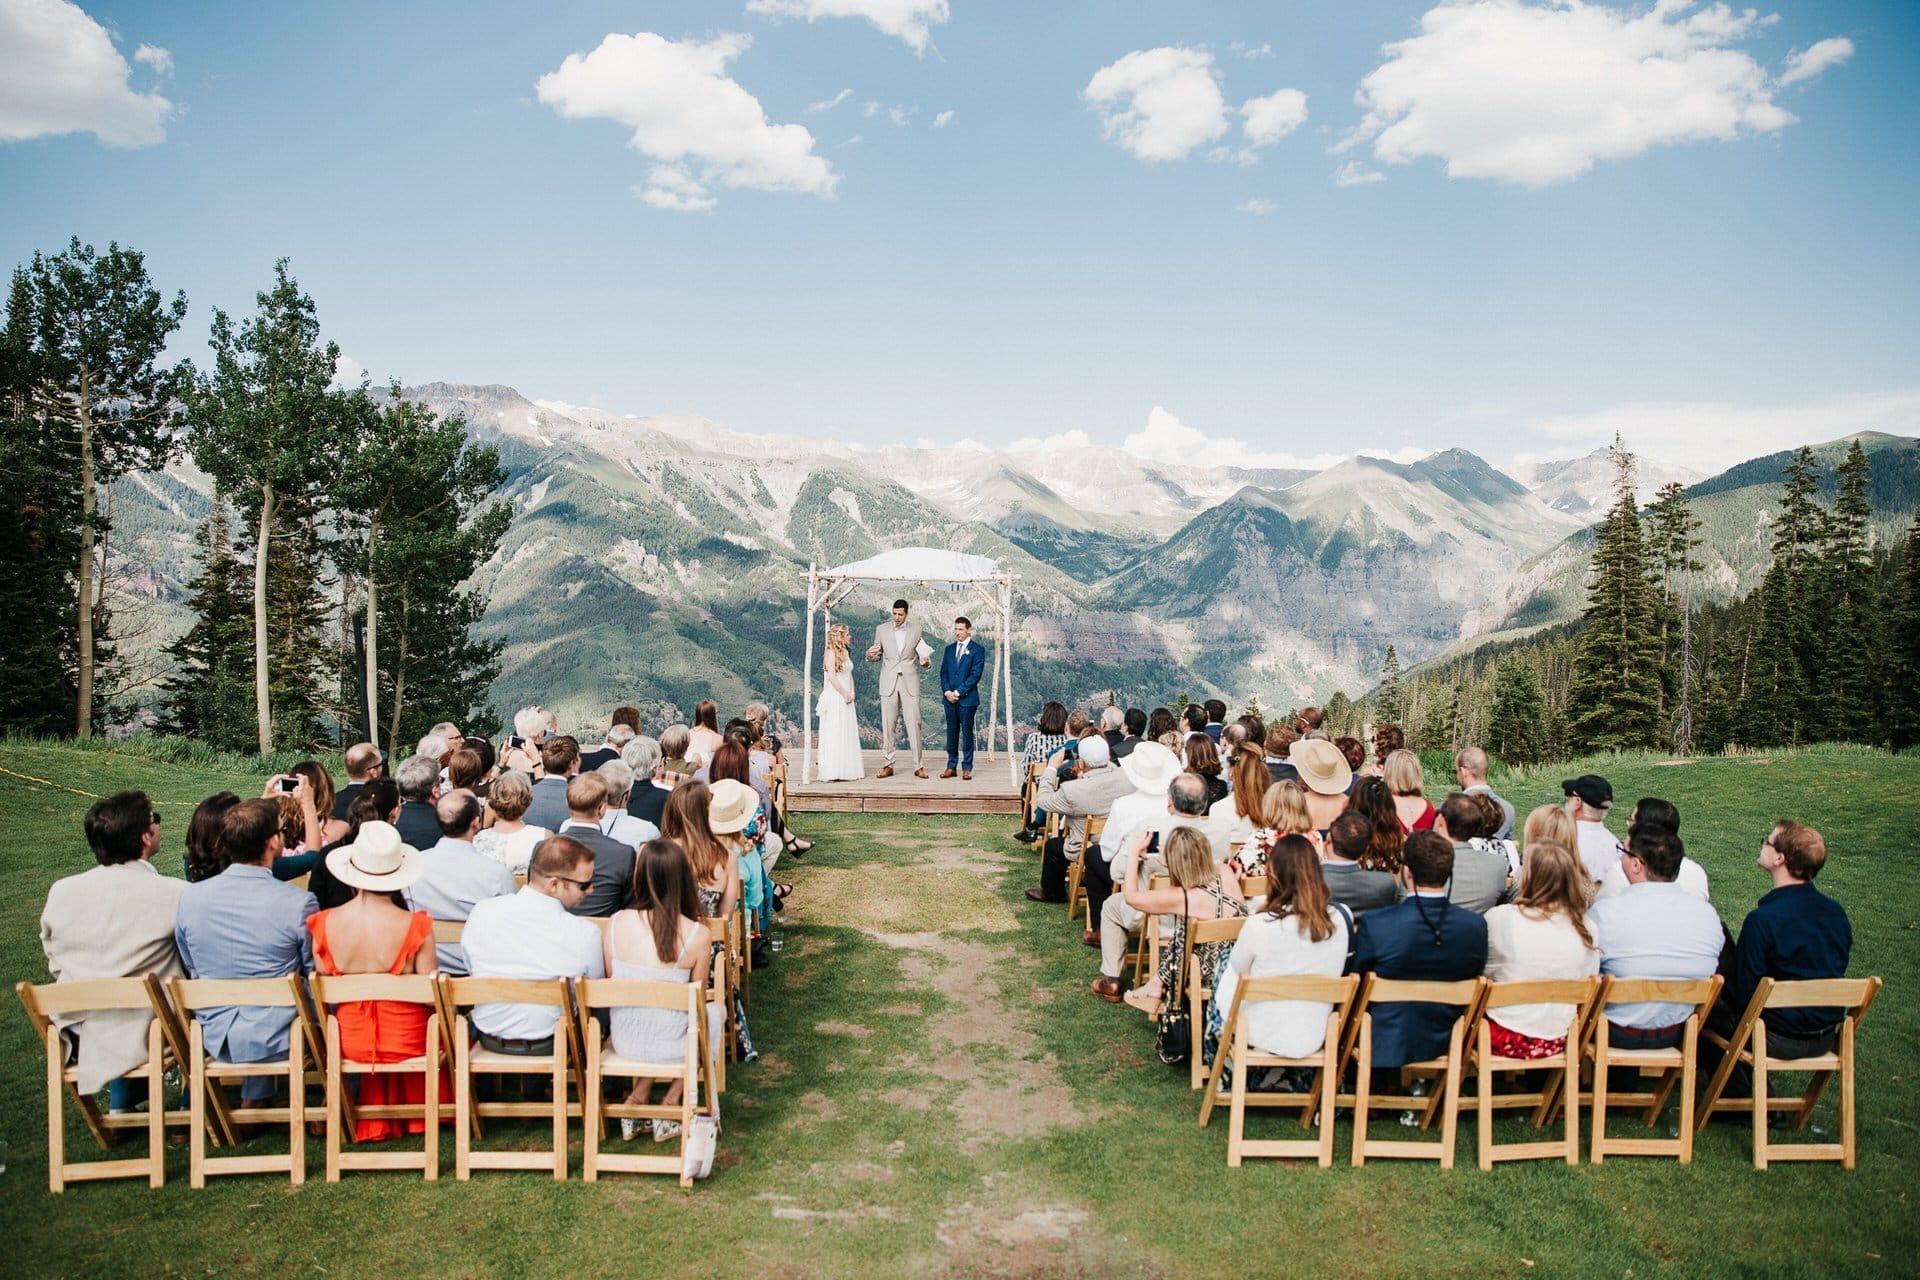 San Sophia Overlook Telluride Mountain View Jewish Wedding Ceremony